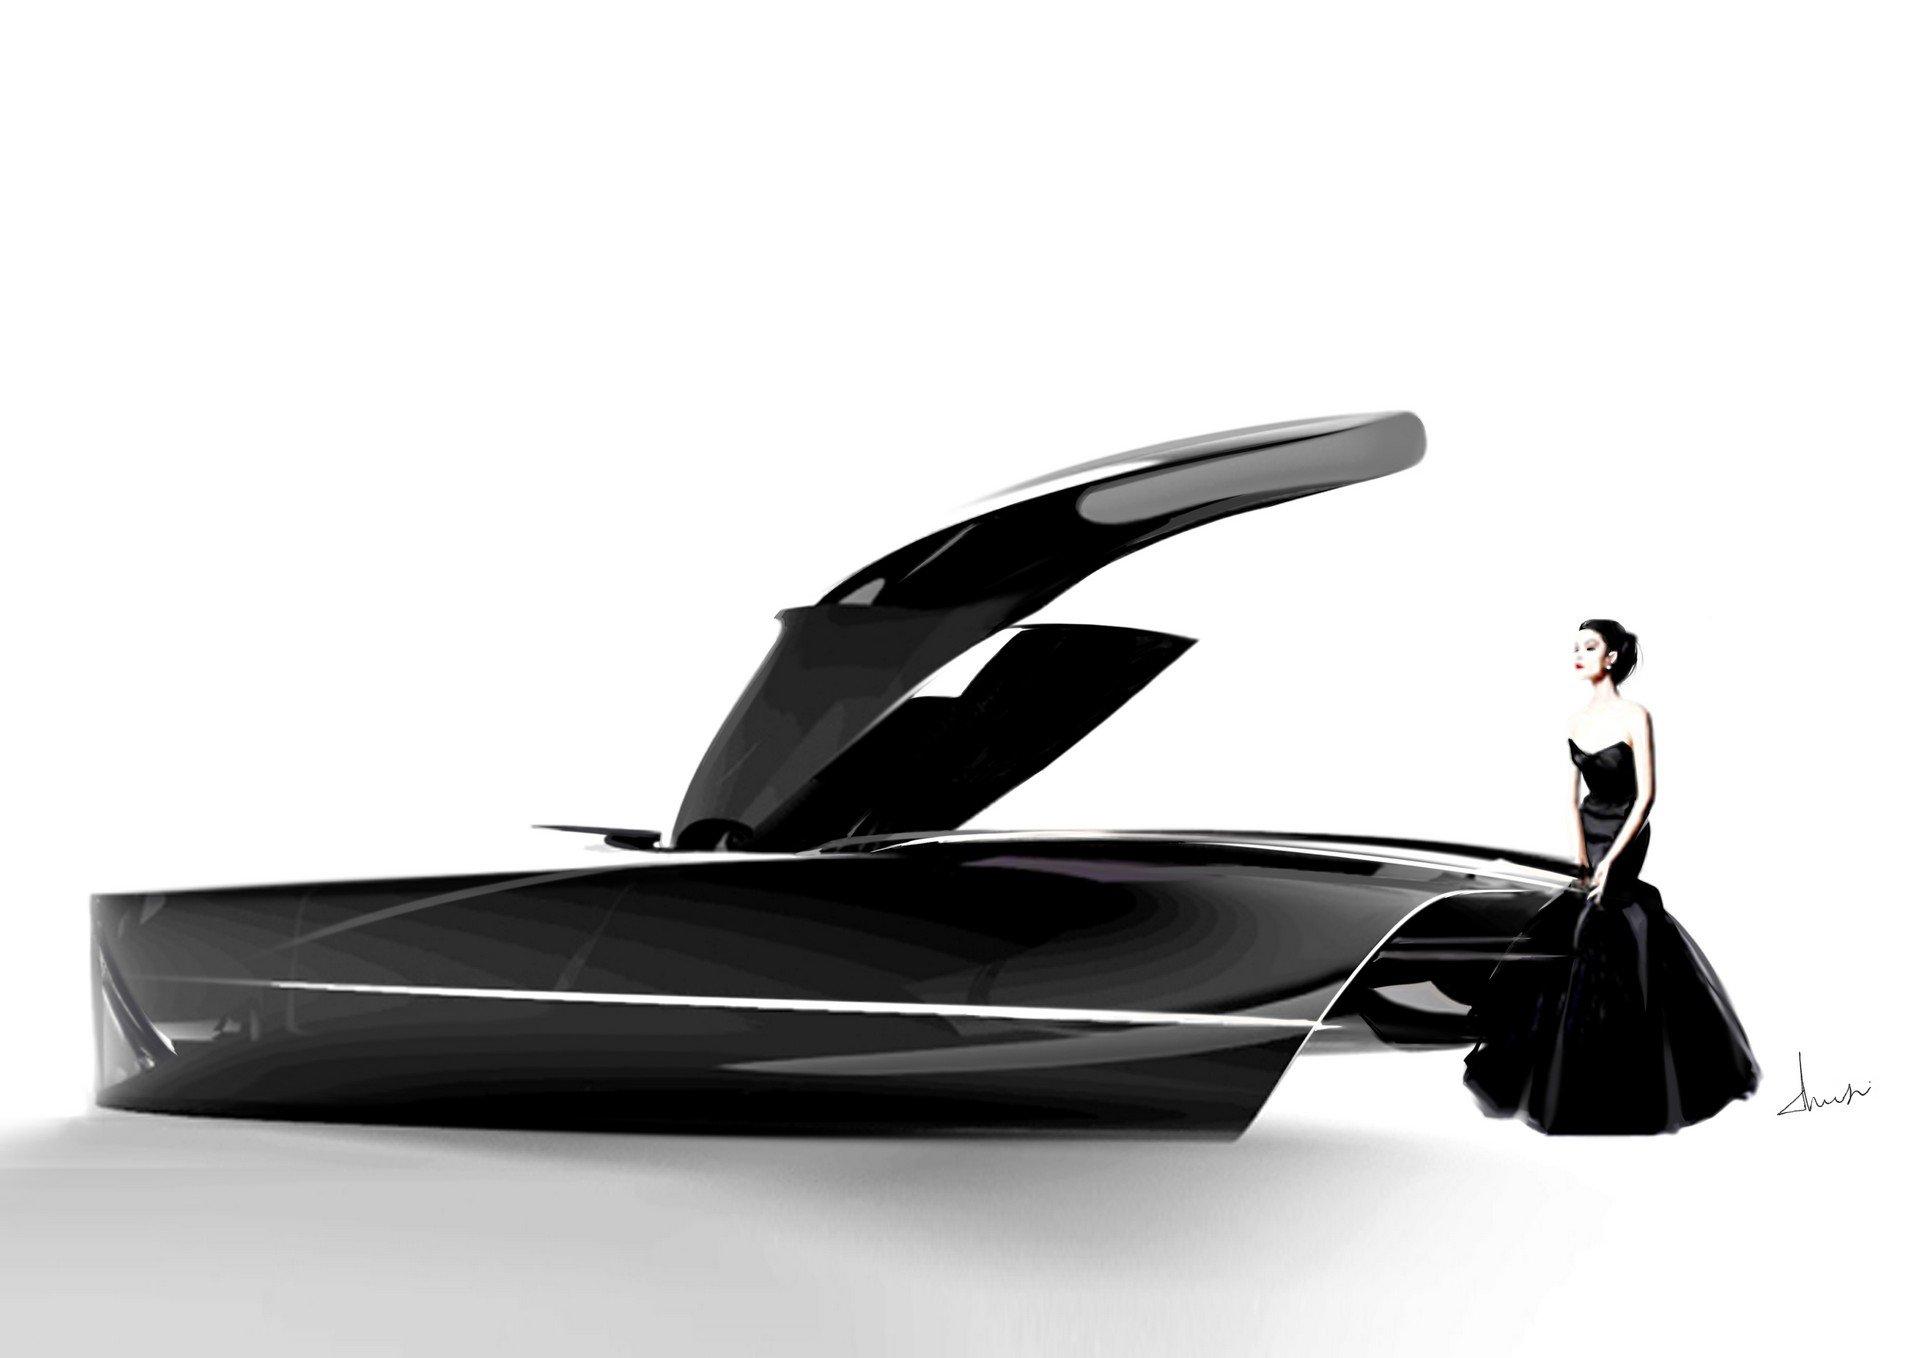 Bentley Future Cars 2050 (1)